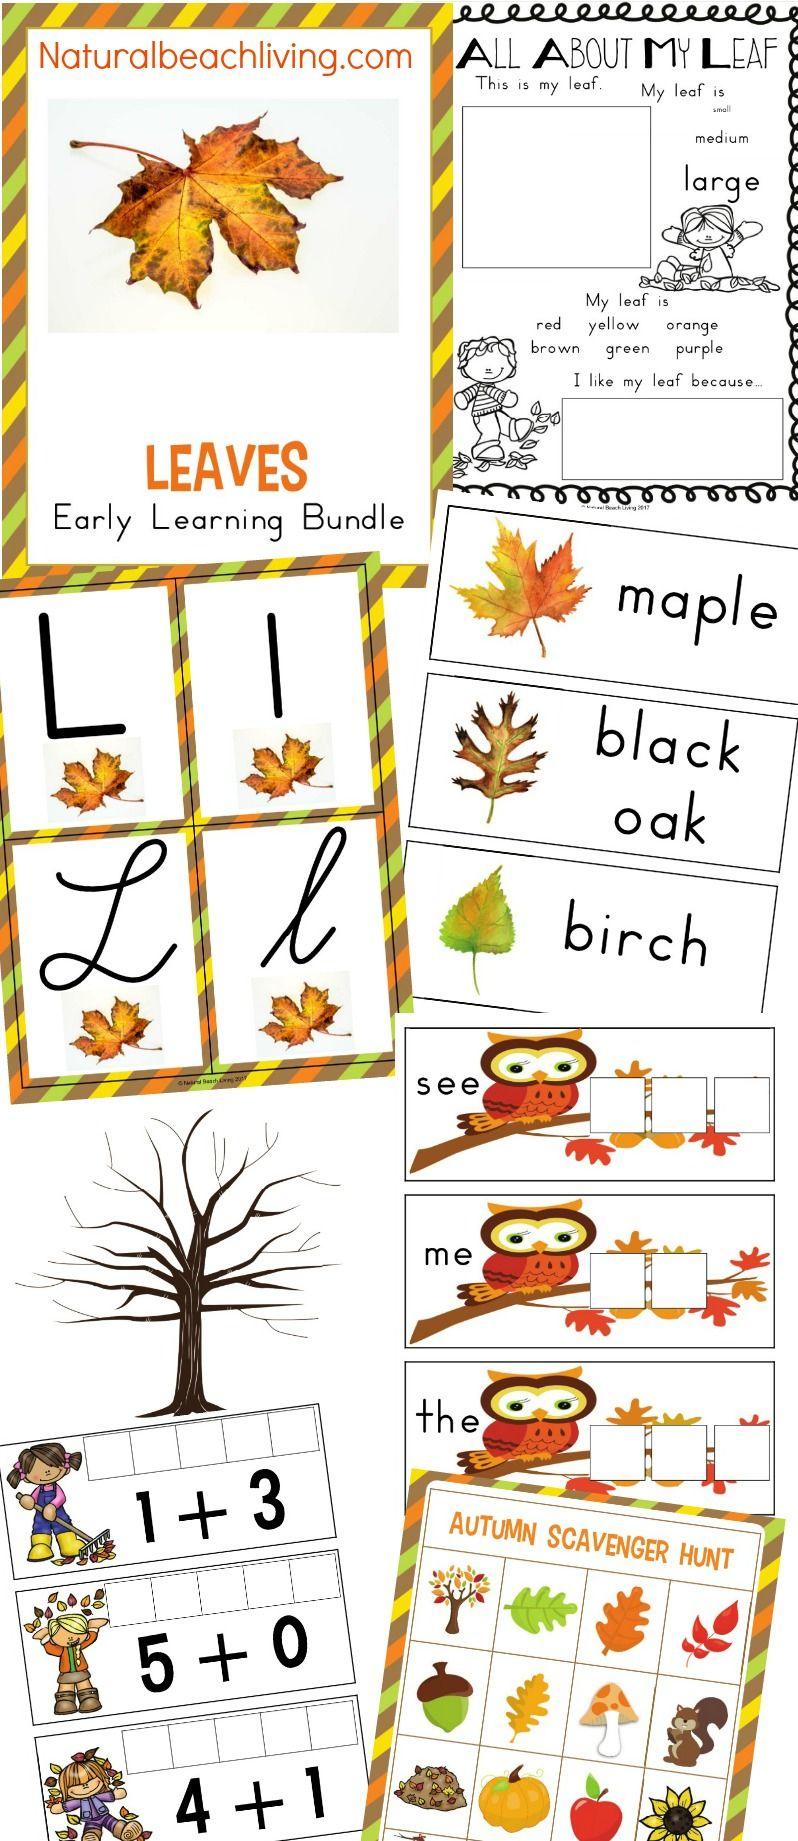 The Best Kindergarten And Preschool Leaf Theme Lesson Plan Preschool Themes Leaf Activities Preschool Re Fall Sensory Bin Preschool Themes Leaf Lesson Plans [ 1841 x 798 Pixel ]